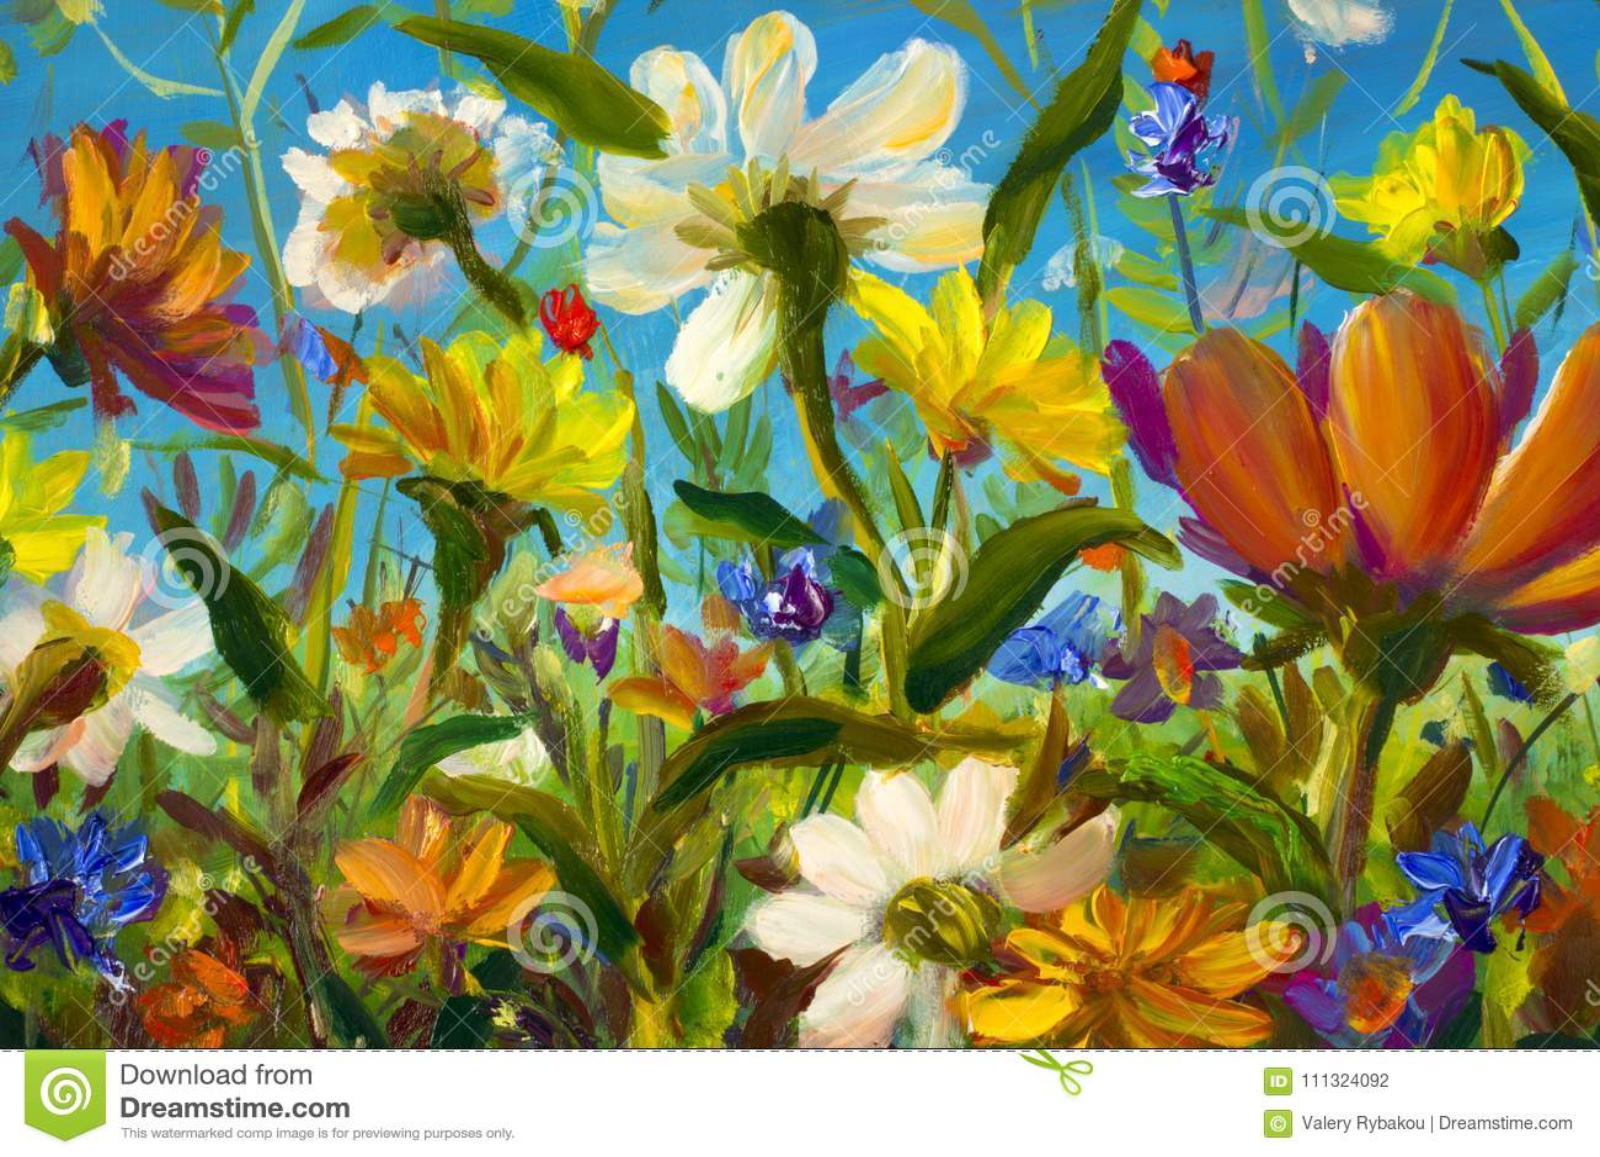 Red, yellow, blue, purple abstract flowers illustration. Macro impasto painting. Palette knife artwork. Impressionism. Art.